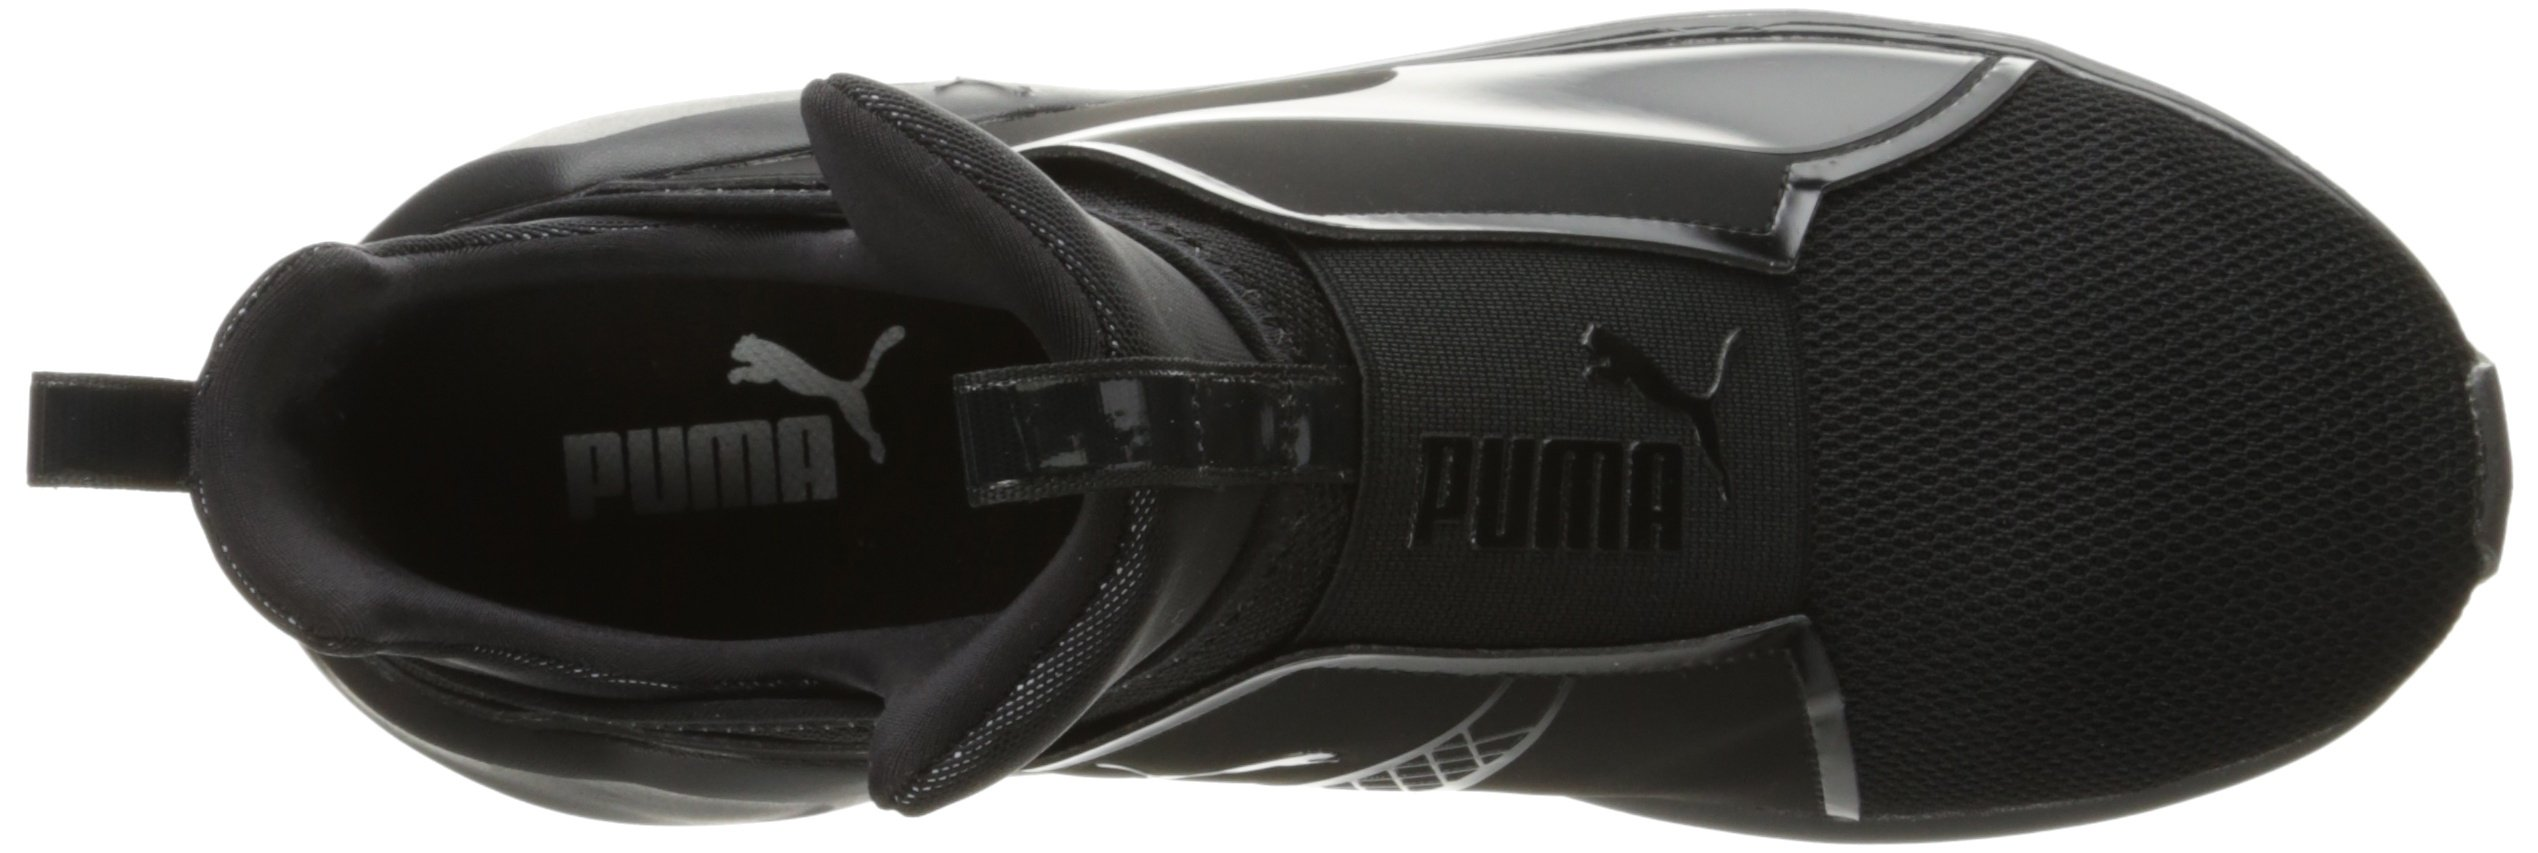 PUMA Women's Fierce Core Cross-Trainer Shoe, Black Black, 9 M US by PUMA (Image #8)